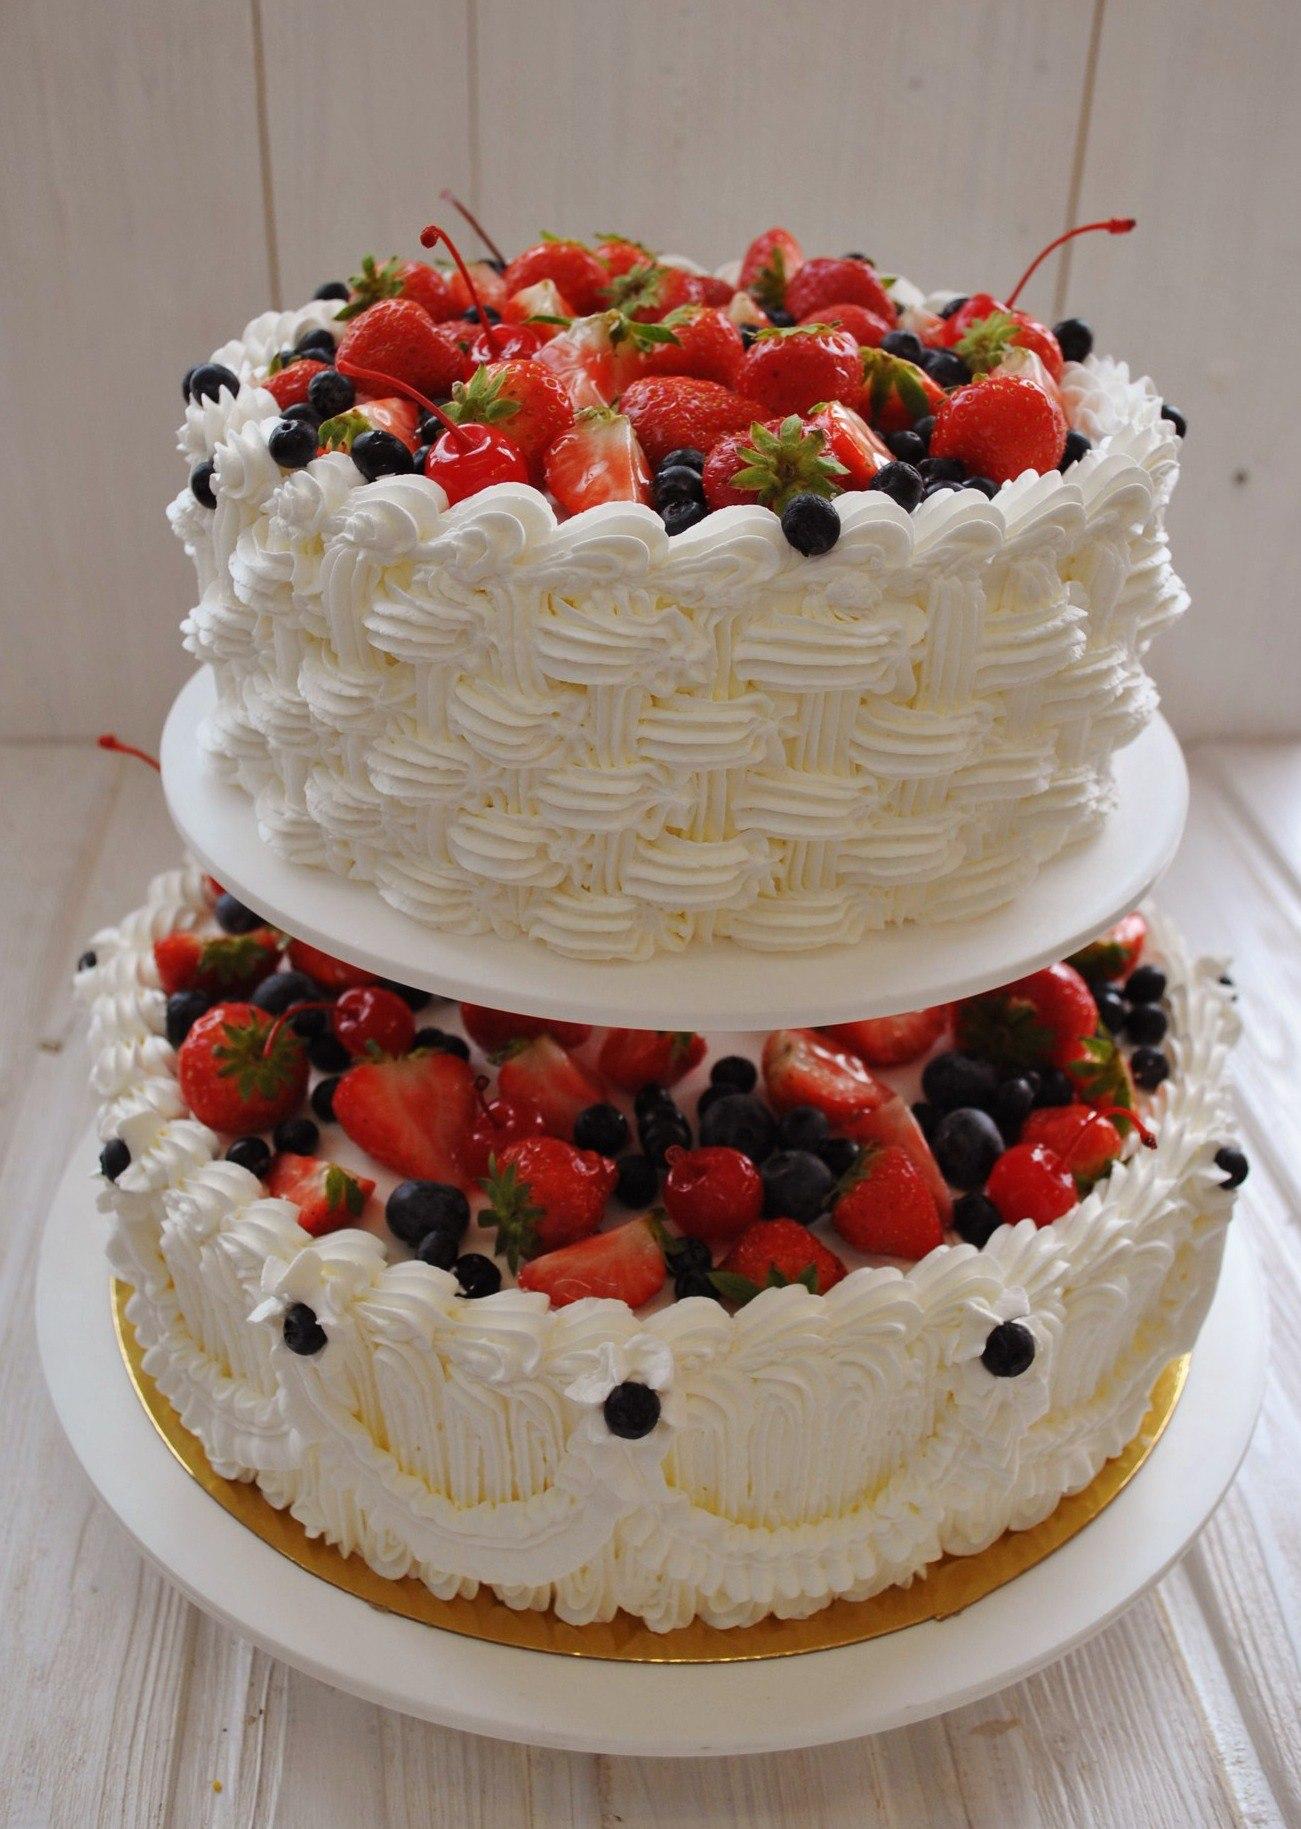 My City Cake в Красноярске